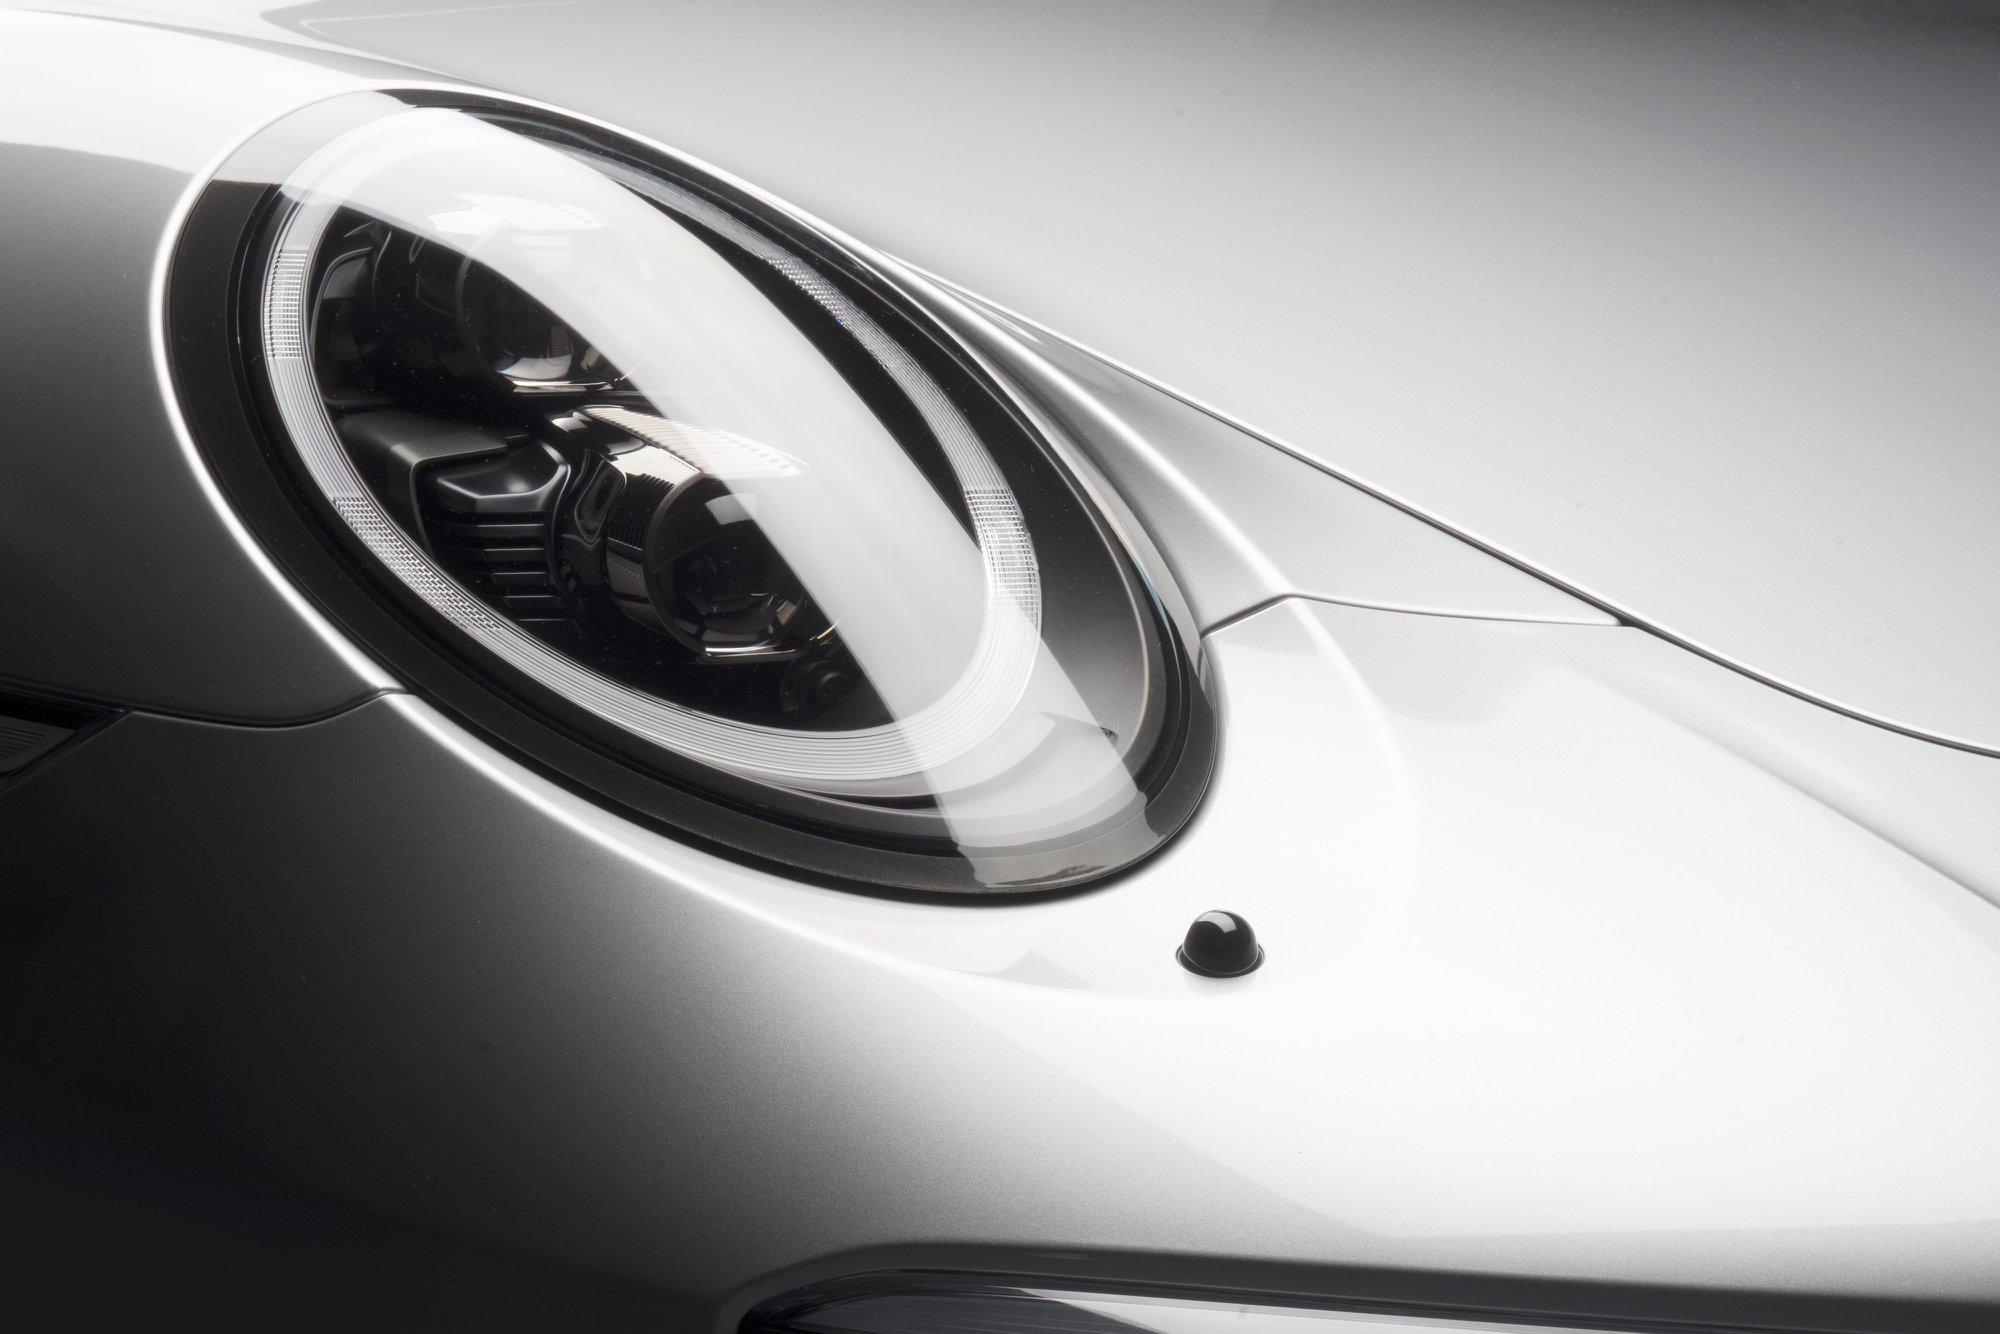 Porsche Exclusive 911 S Cabriolet (3)